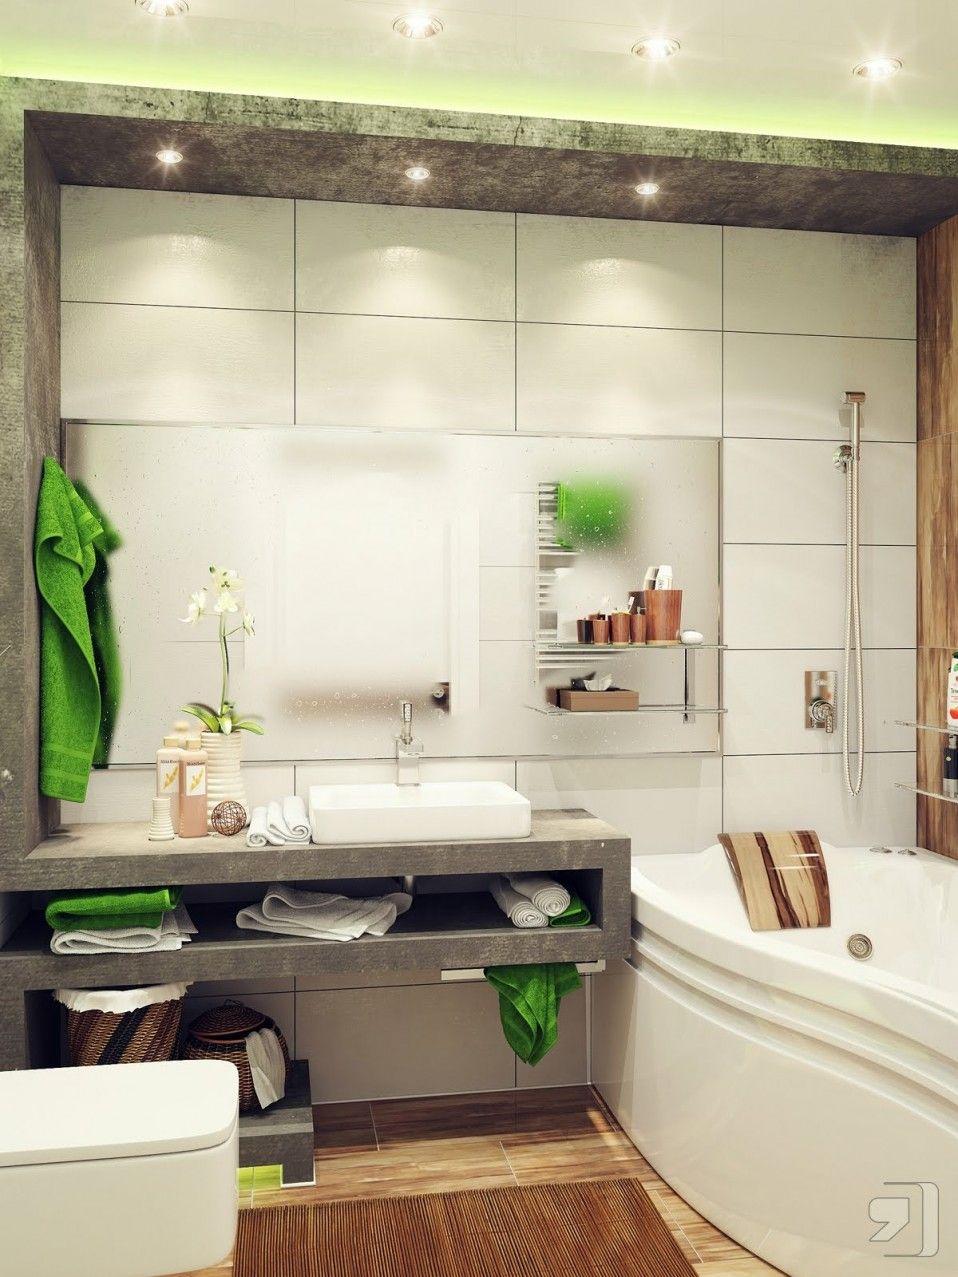 White Modern Bathroom Feats Exotic Cube Washbasin, wood look tile on ...